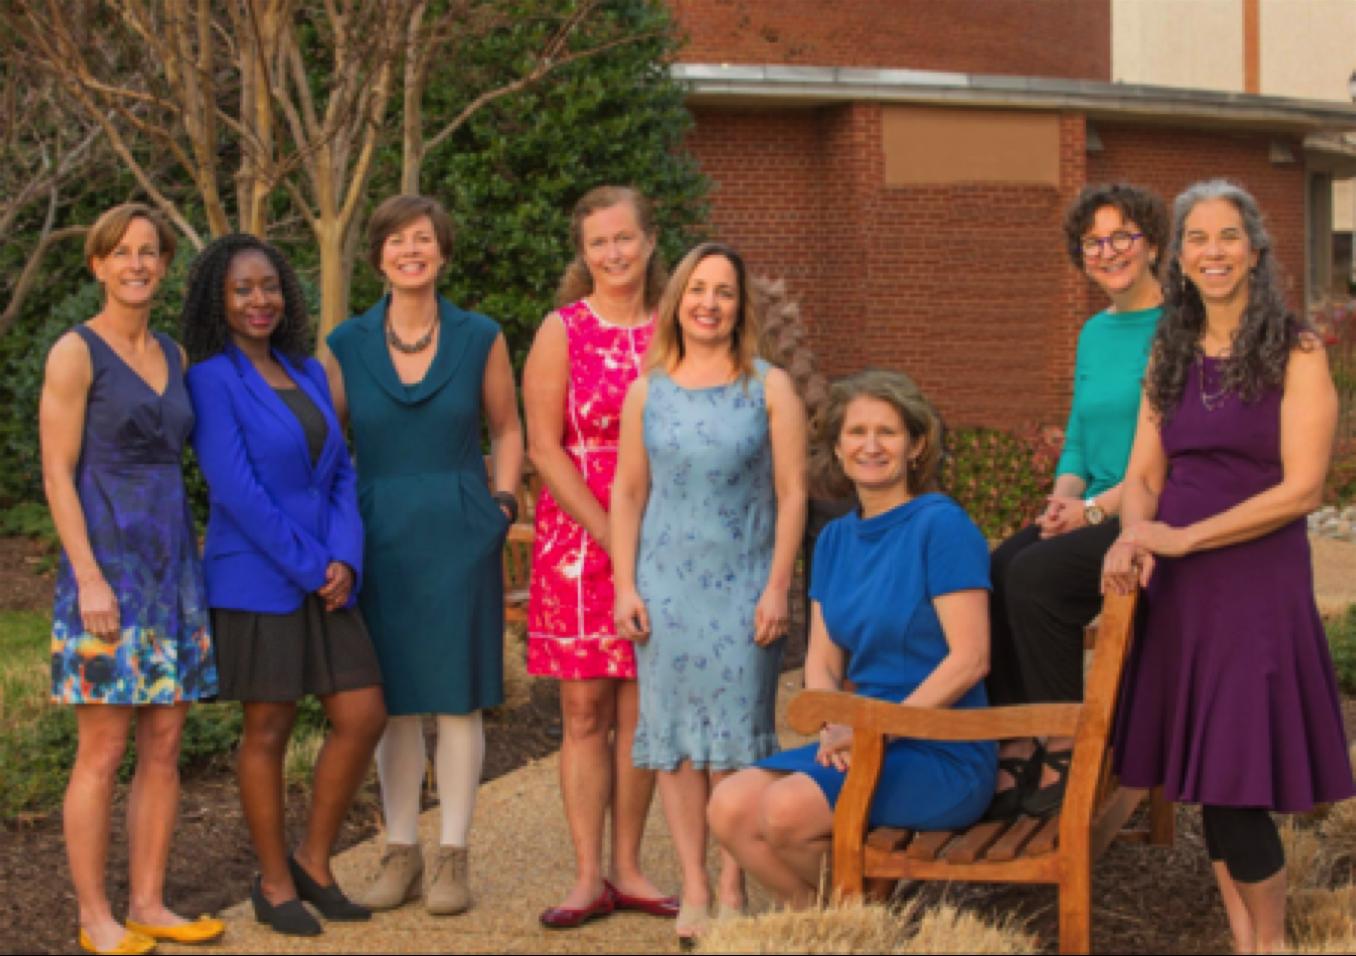 Midwives of MedStar Washington Hospital Center -